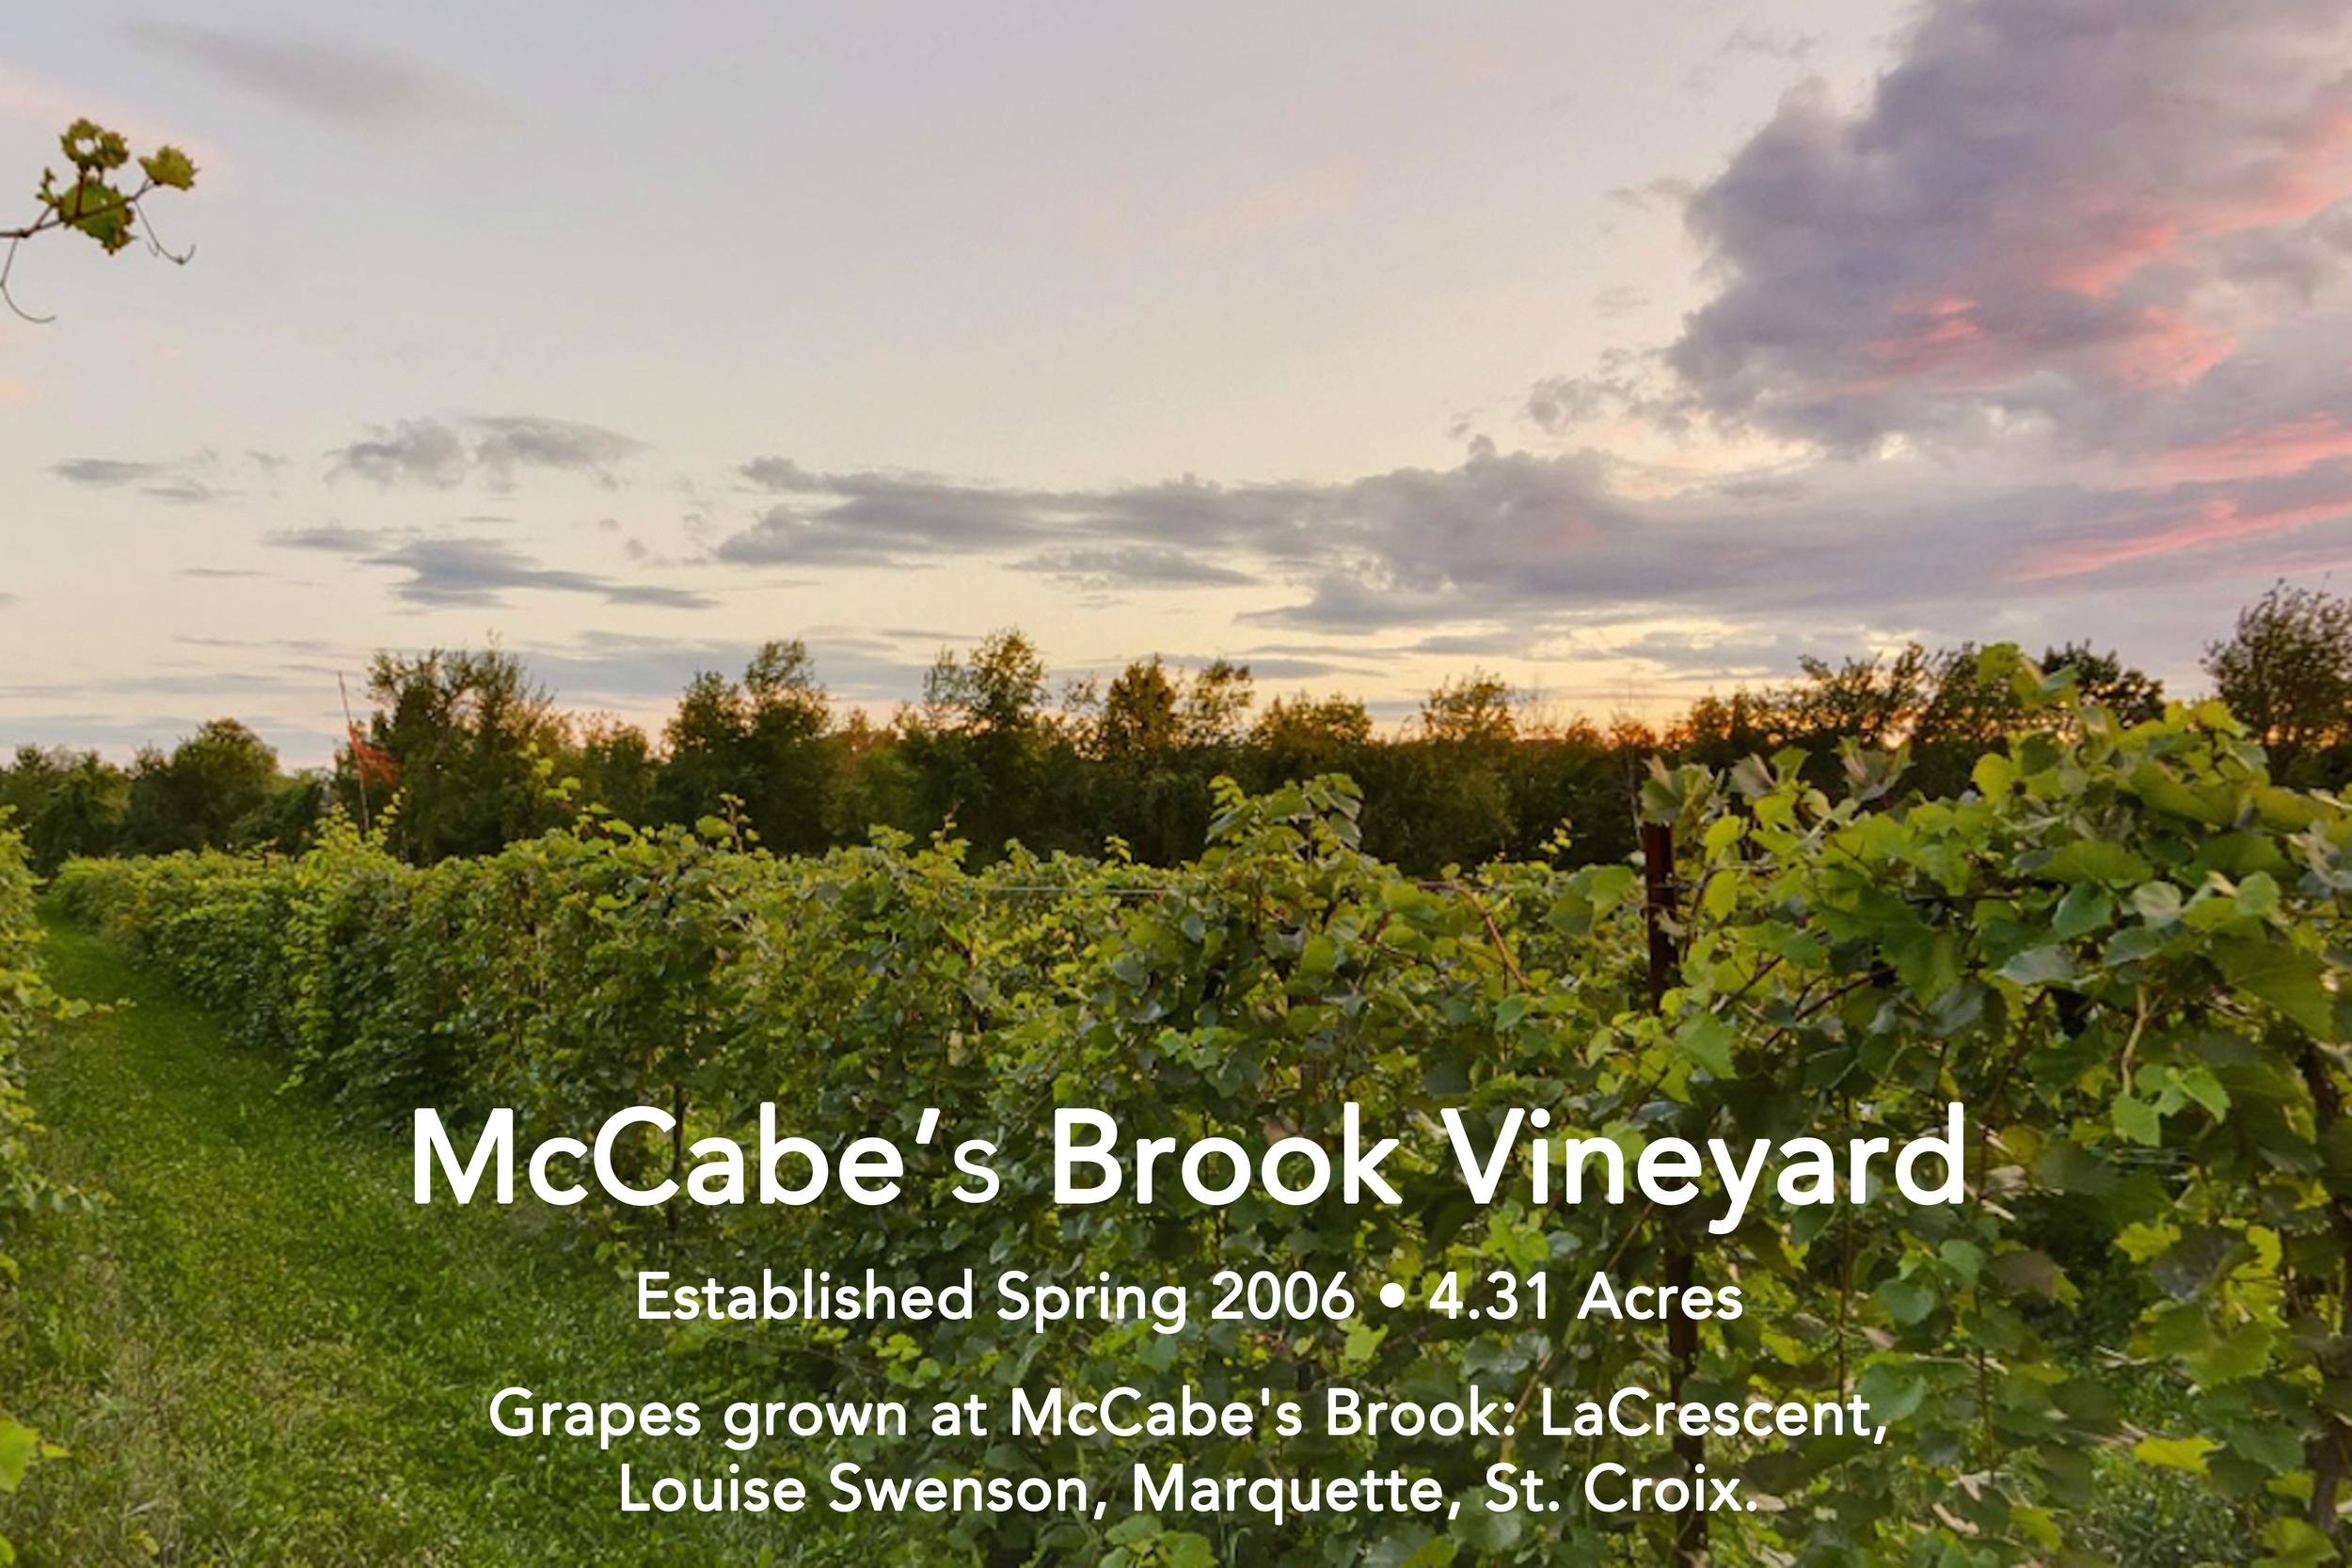 McCabe's Brook Vineyard